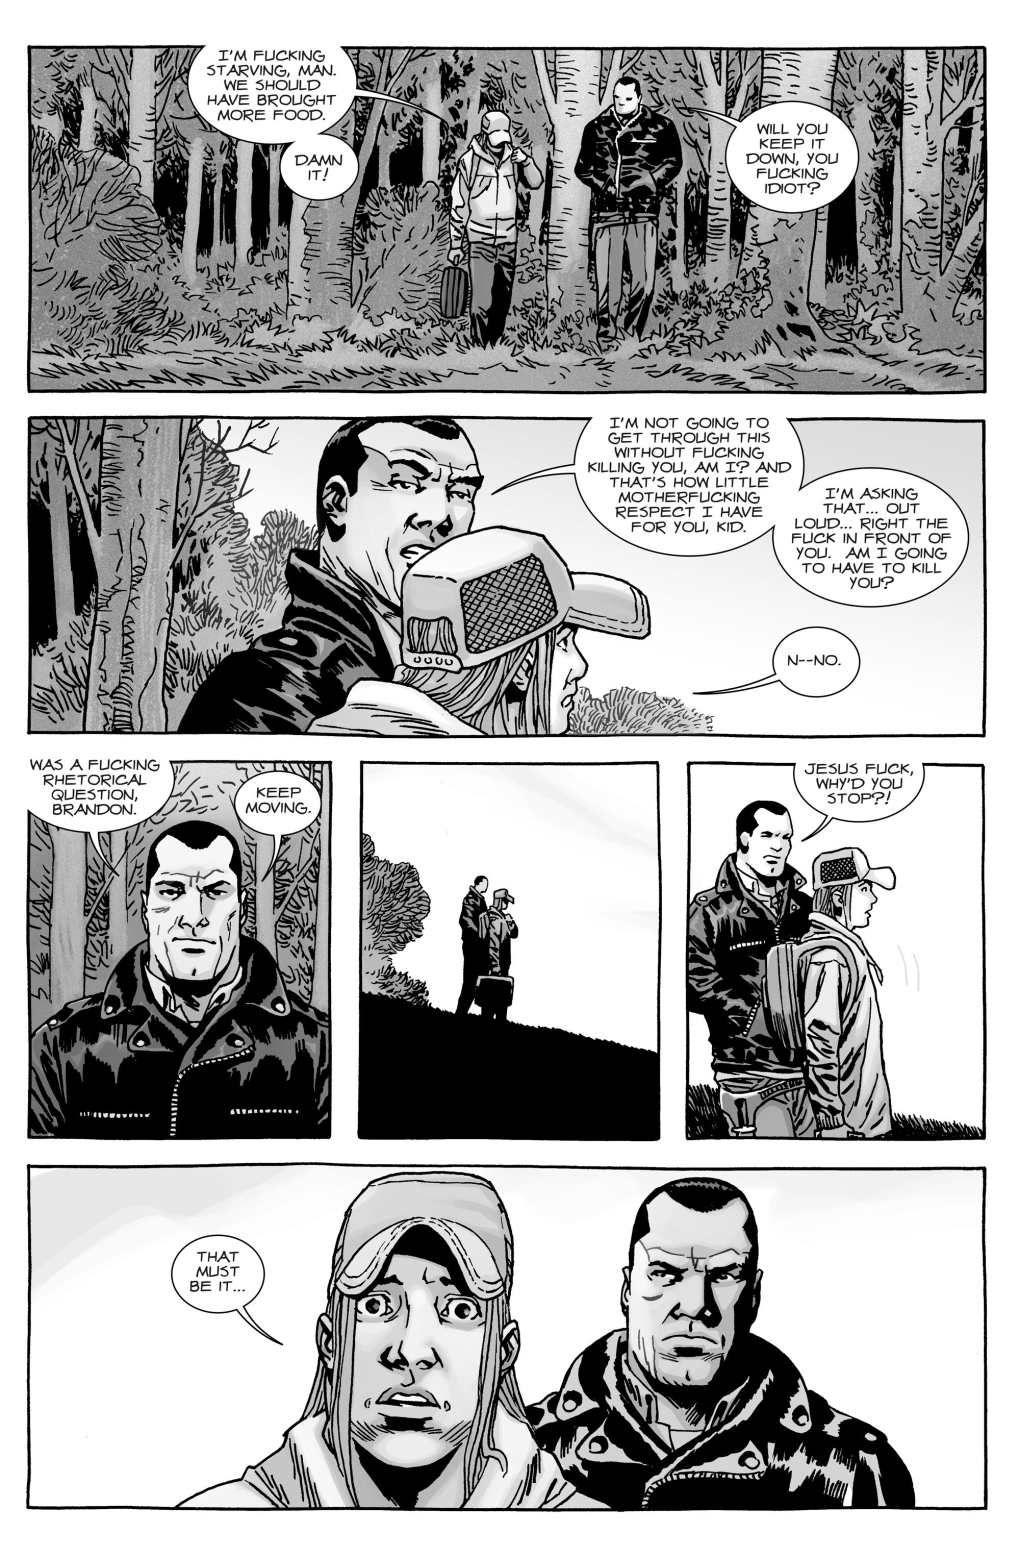 Read Comics Online Free - The Walking Dead - Chapter 153